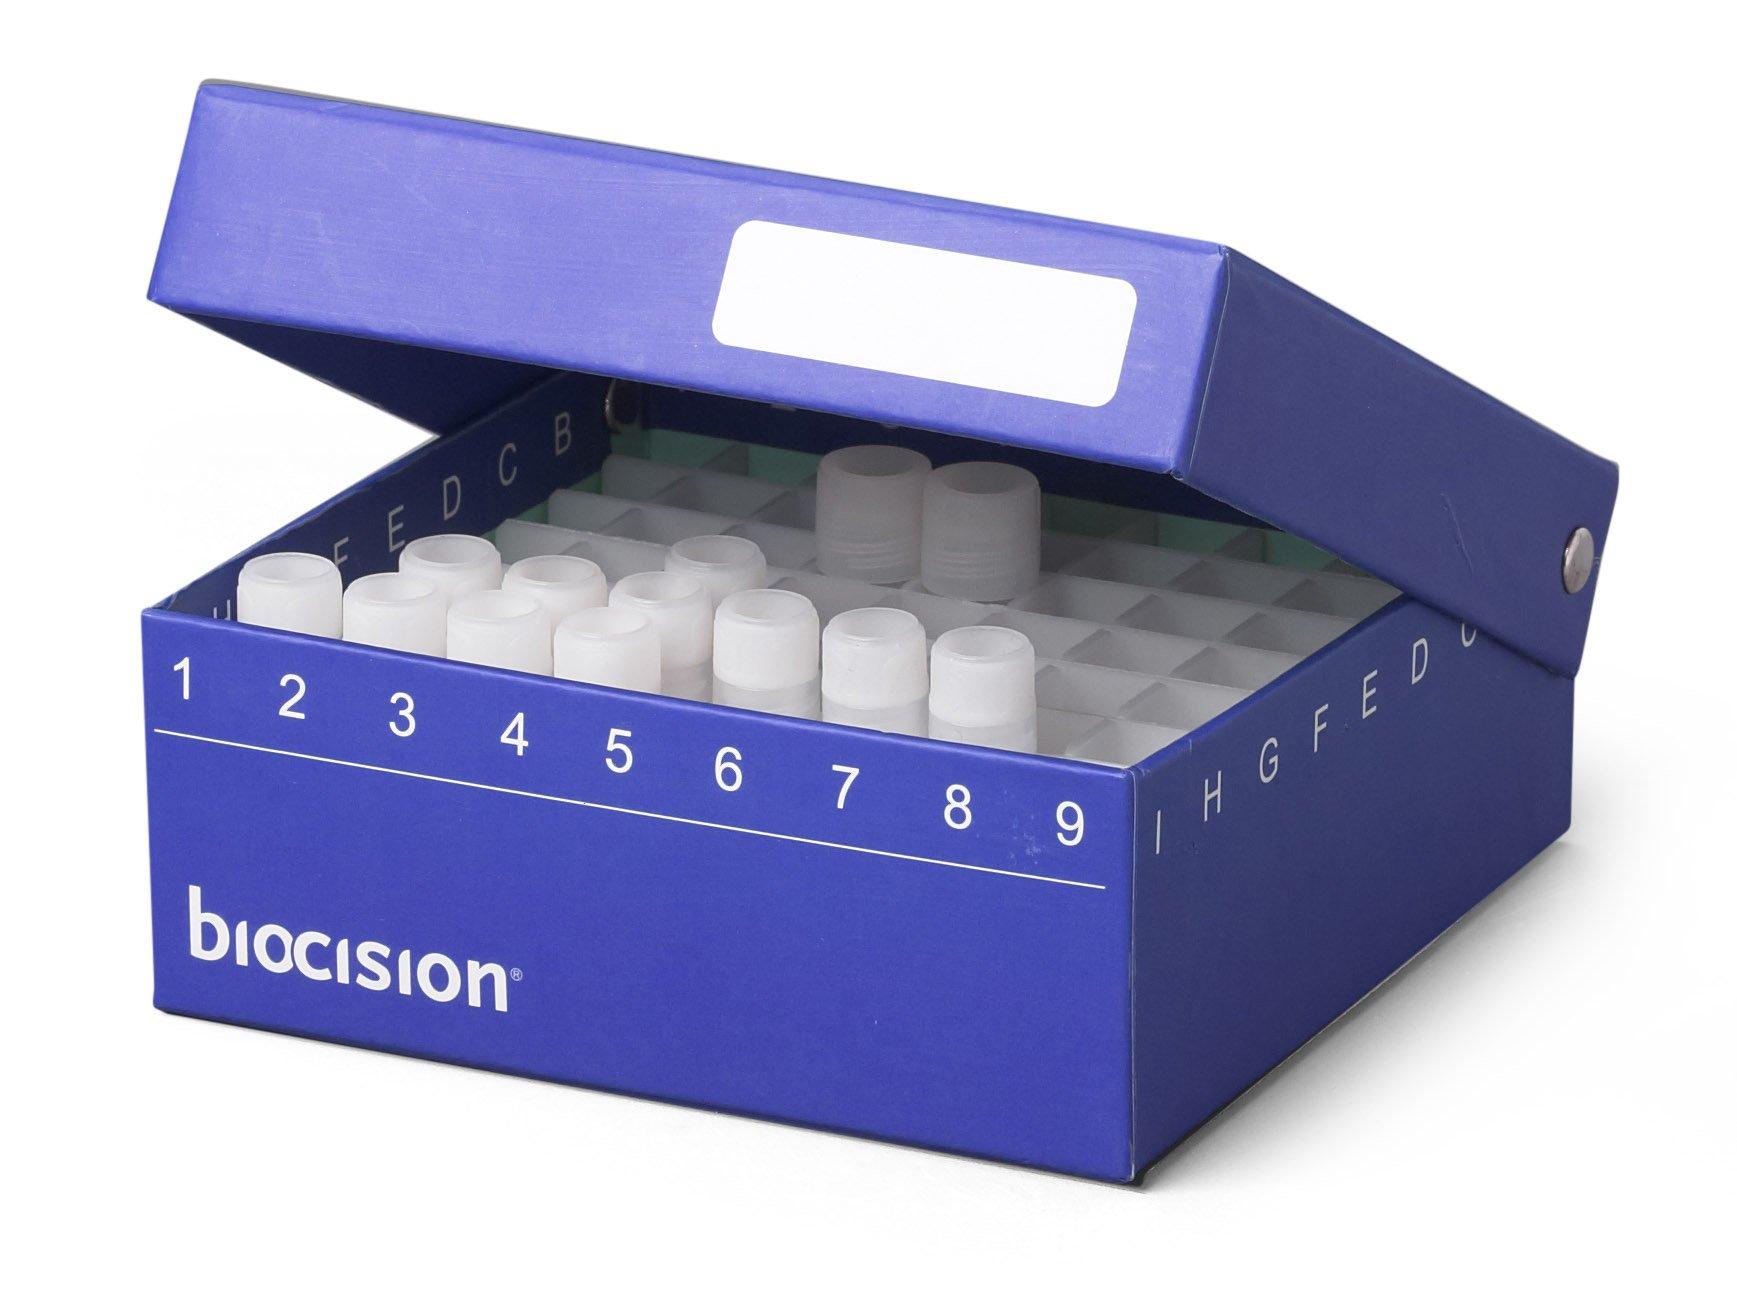 Biocision BCS-206B Blue TruCool Hinged Cryobox (Pack of 5)